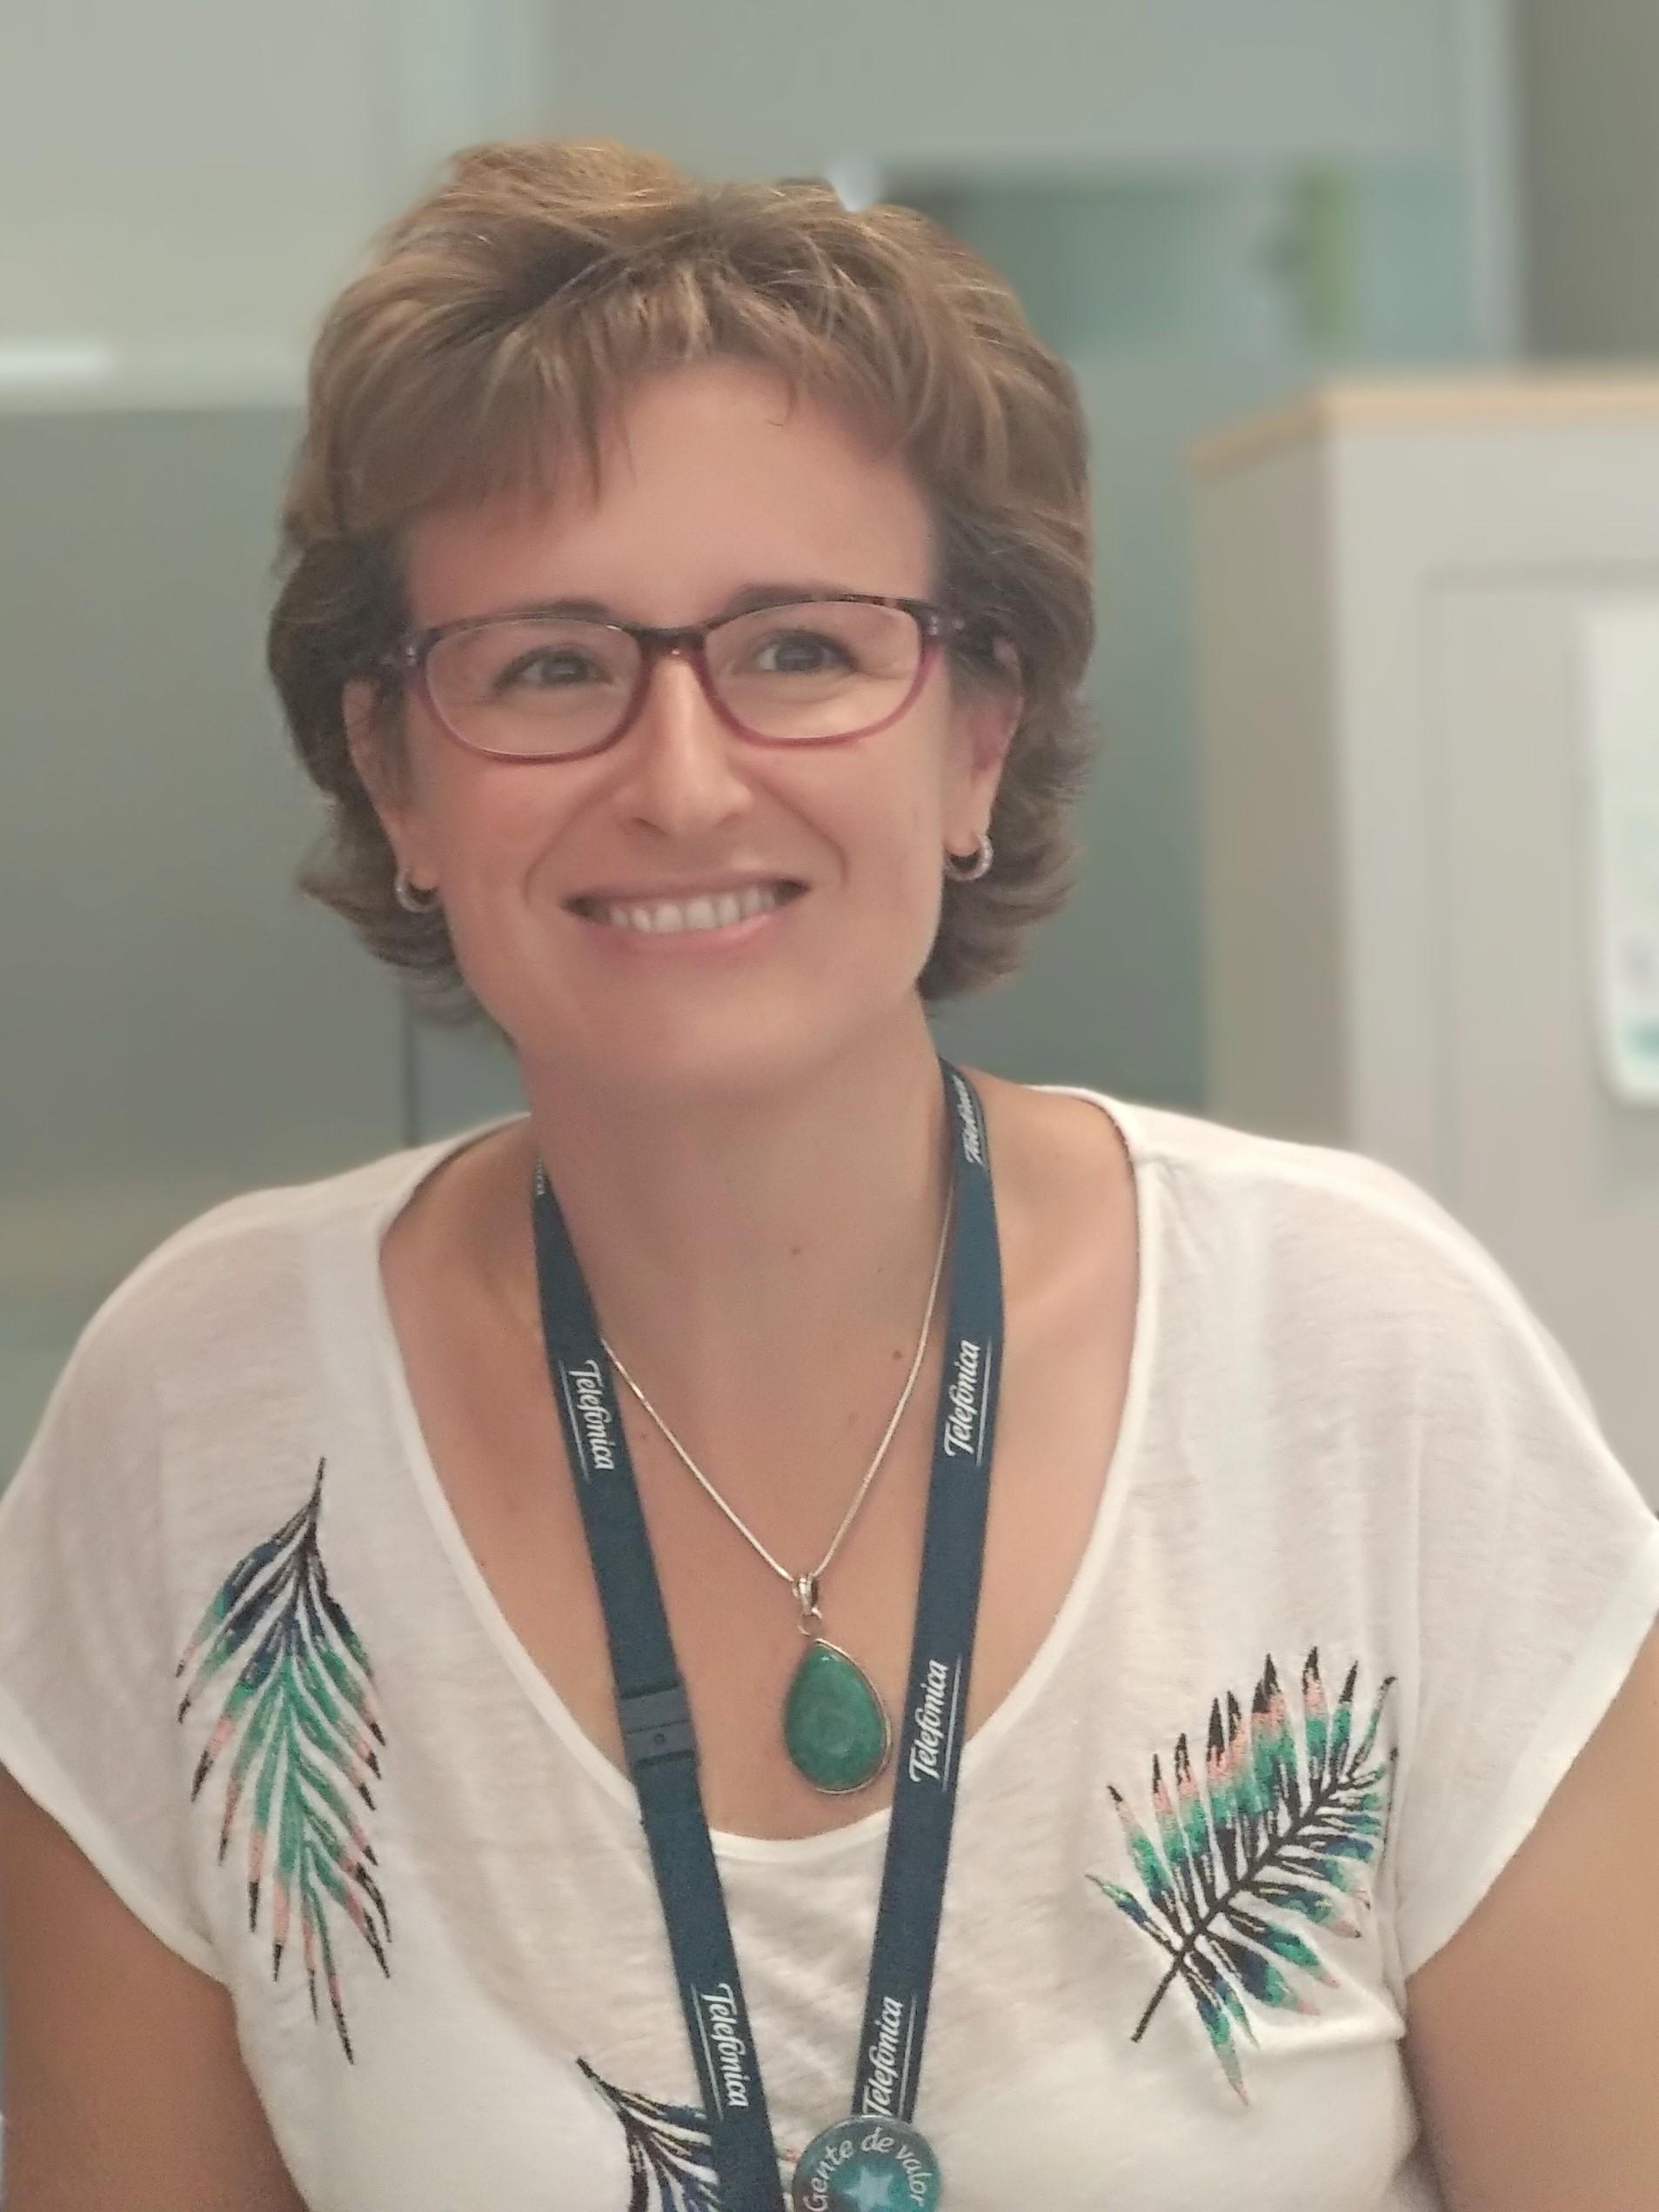 Mª Teresa Reinoso Gamino